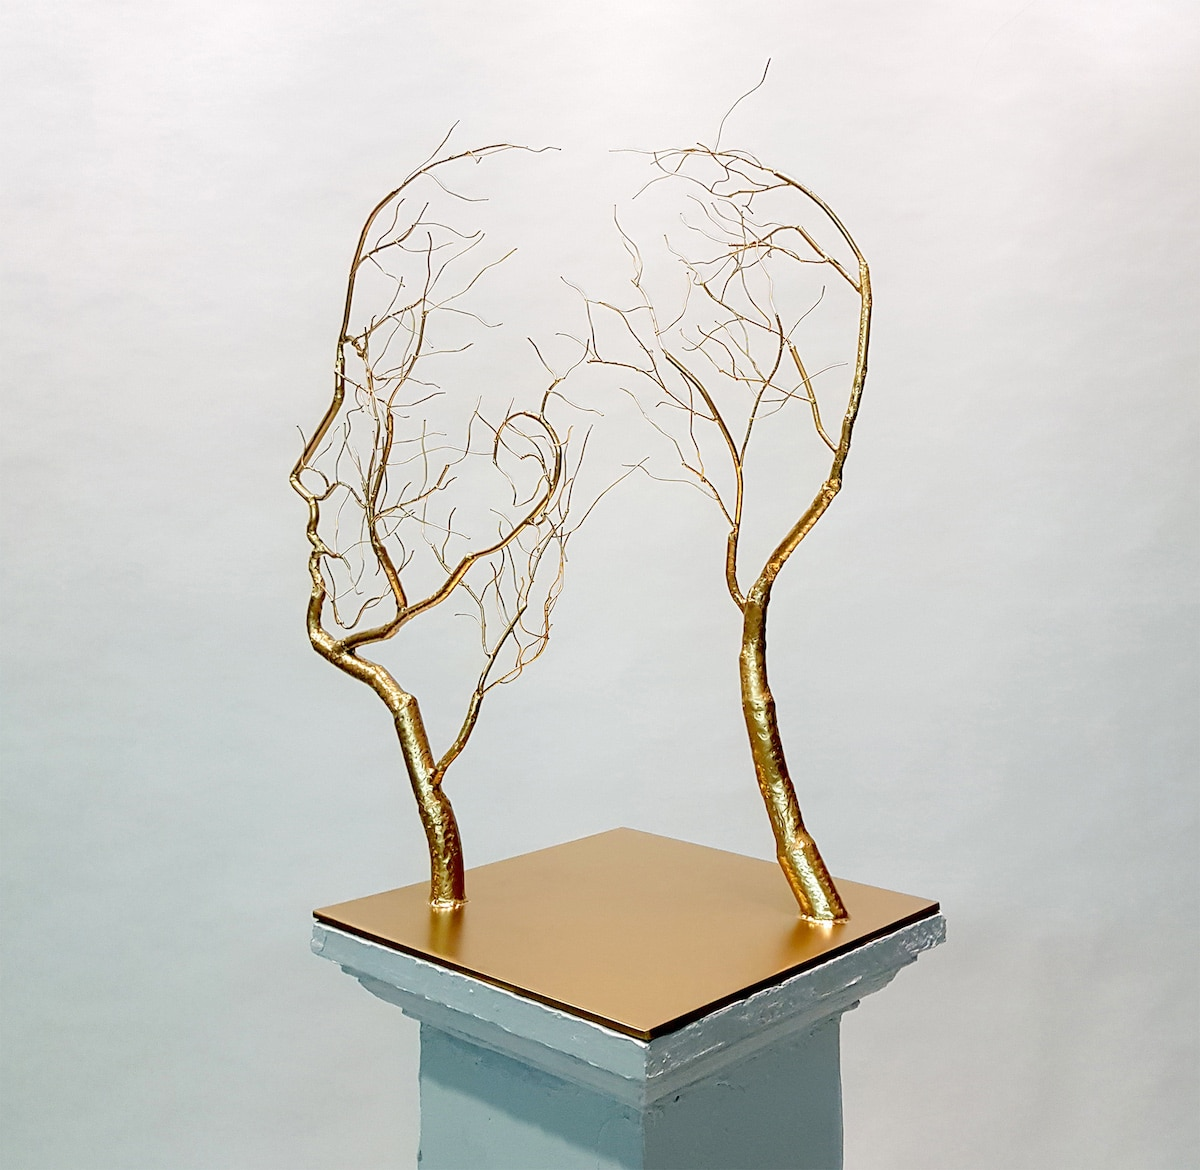 Metal Figurative Sculptures by Sun-Hyuk Kim